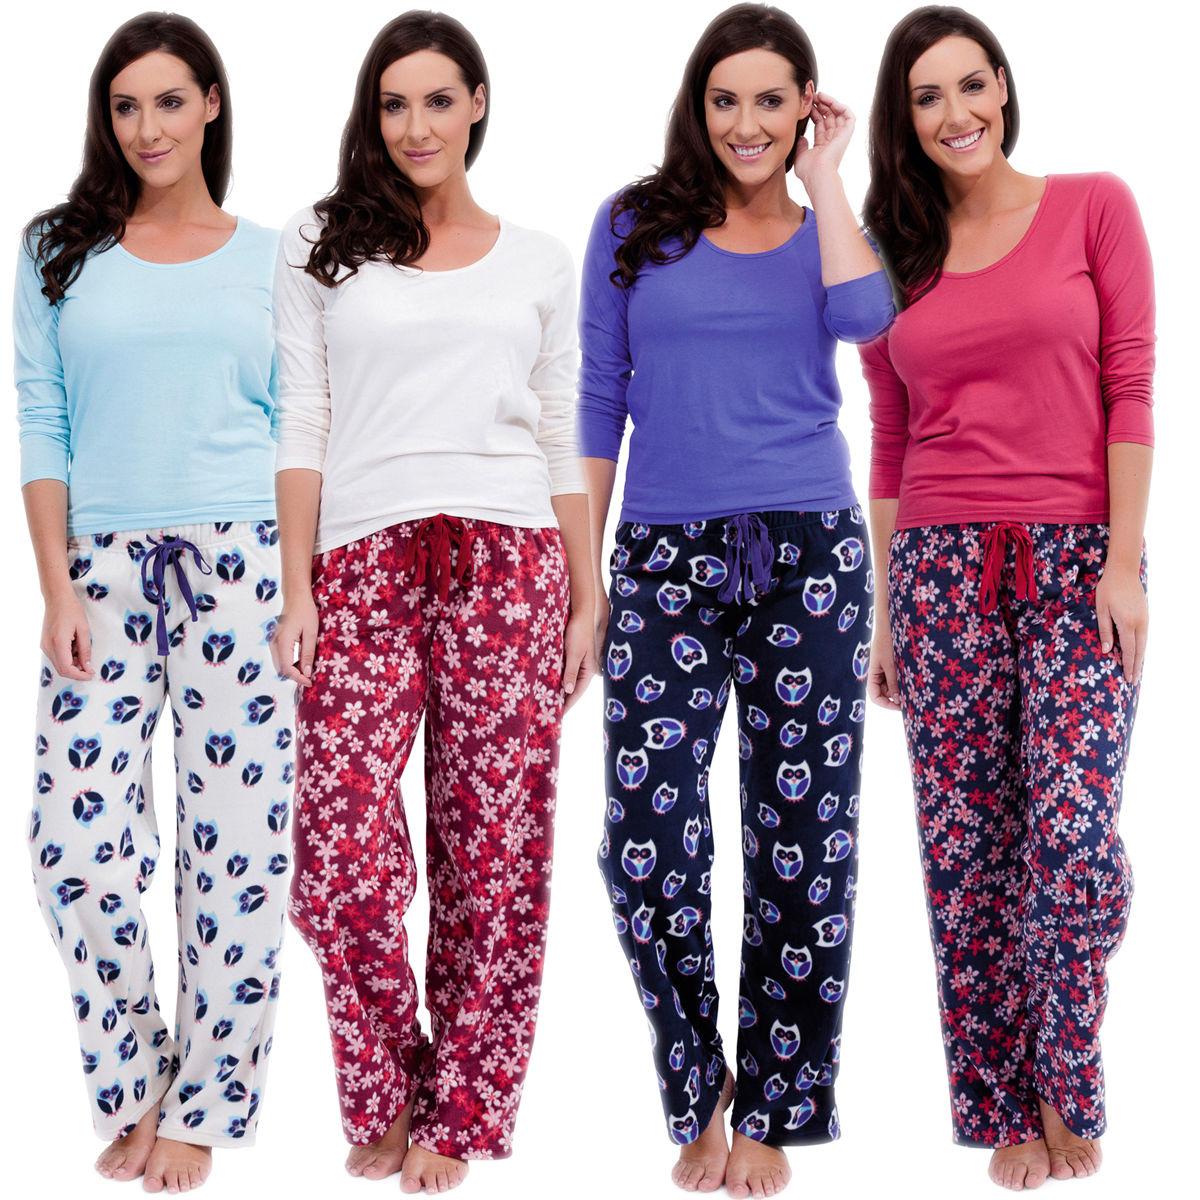 Womens Warm Fleece Winter PJ Pyjama Set Night Wear PJ's ...